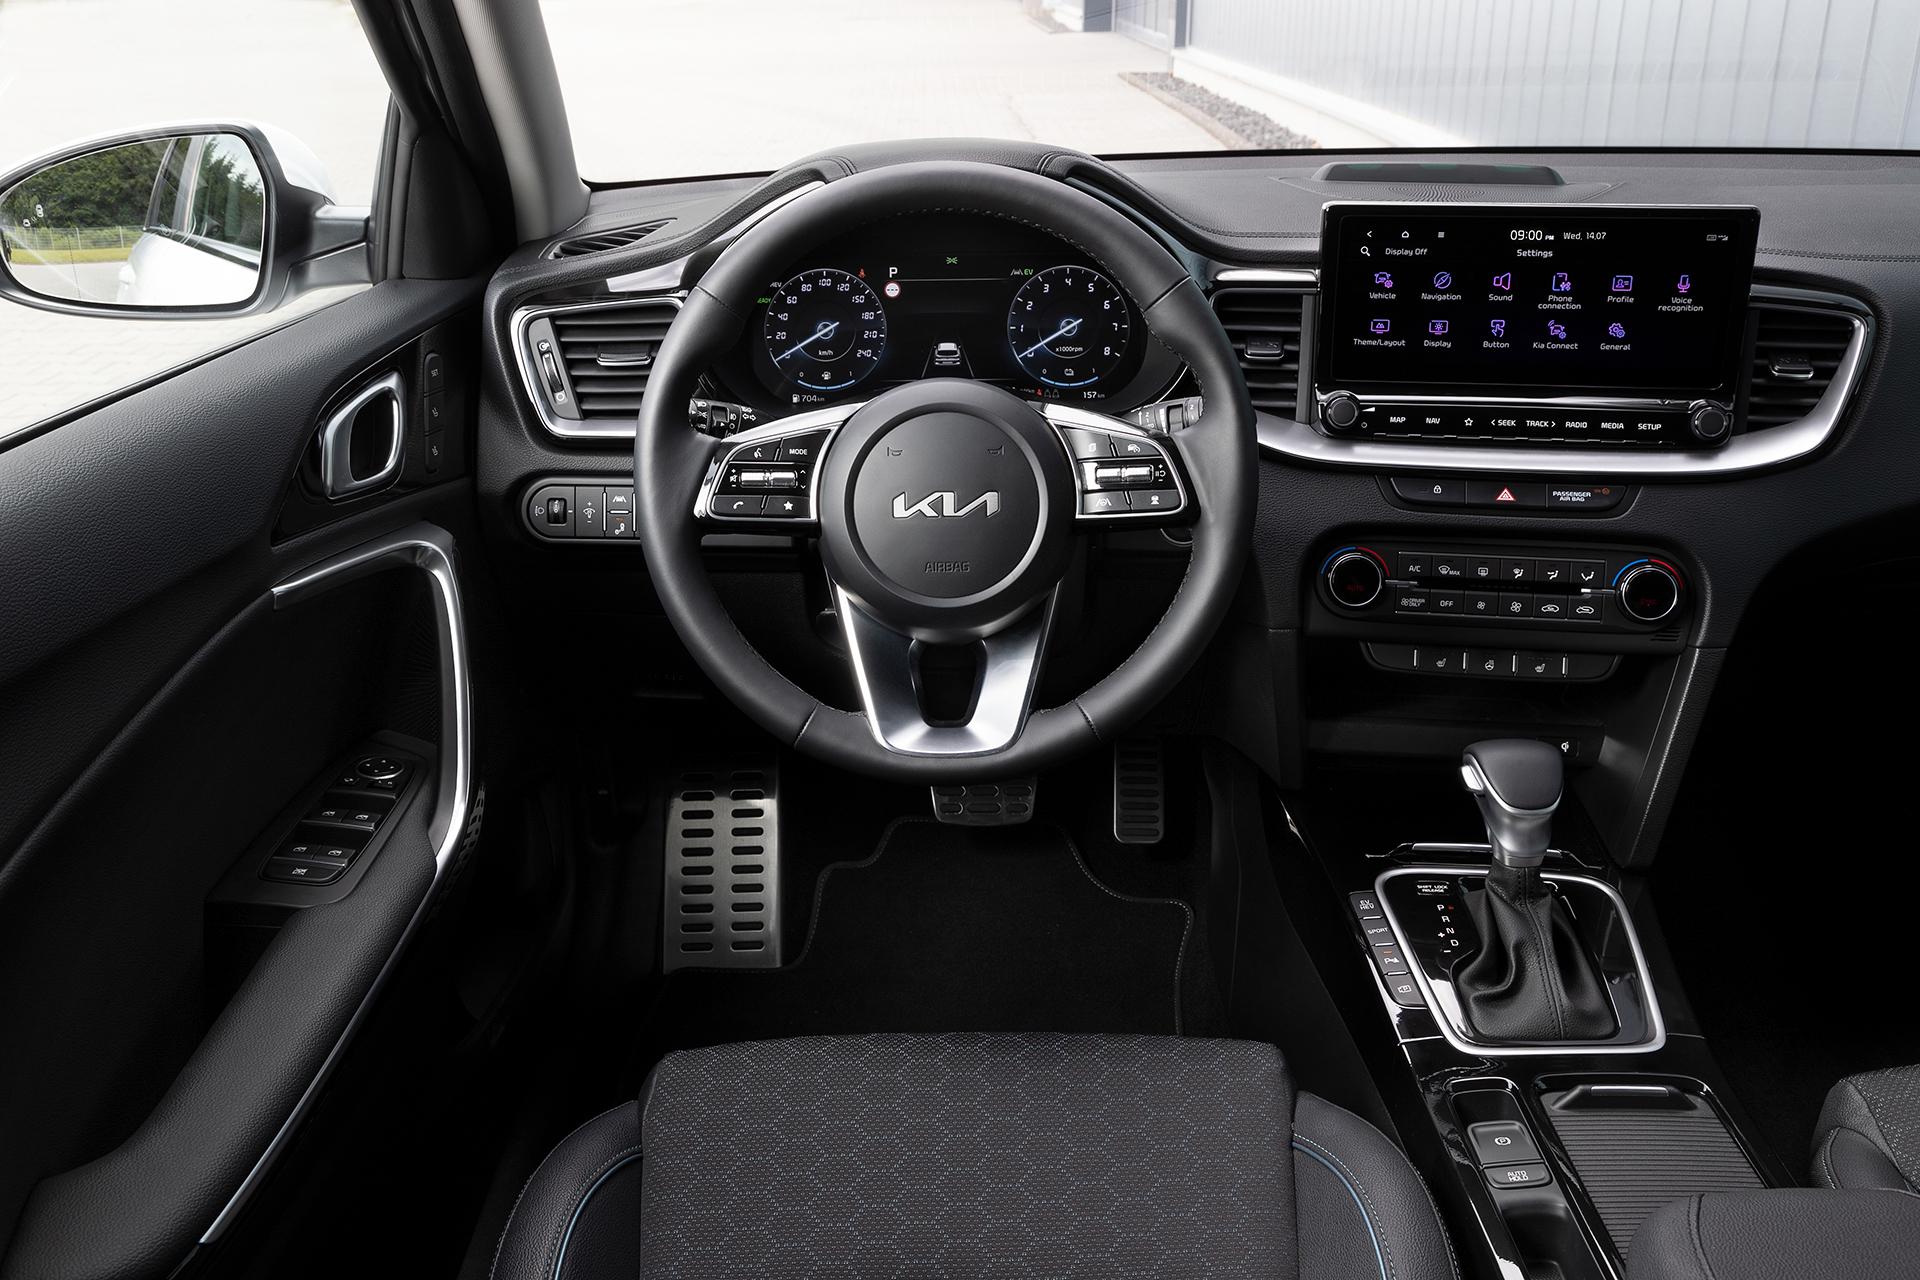 2022 facelift Kia Ceed interior